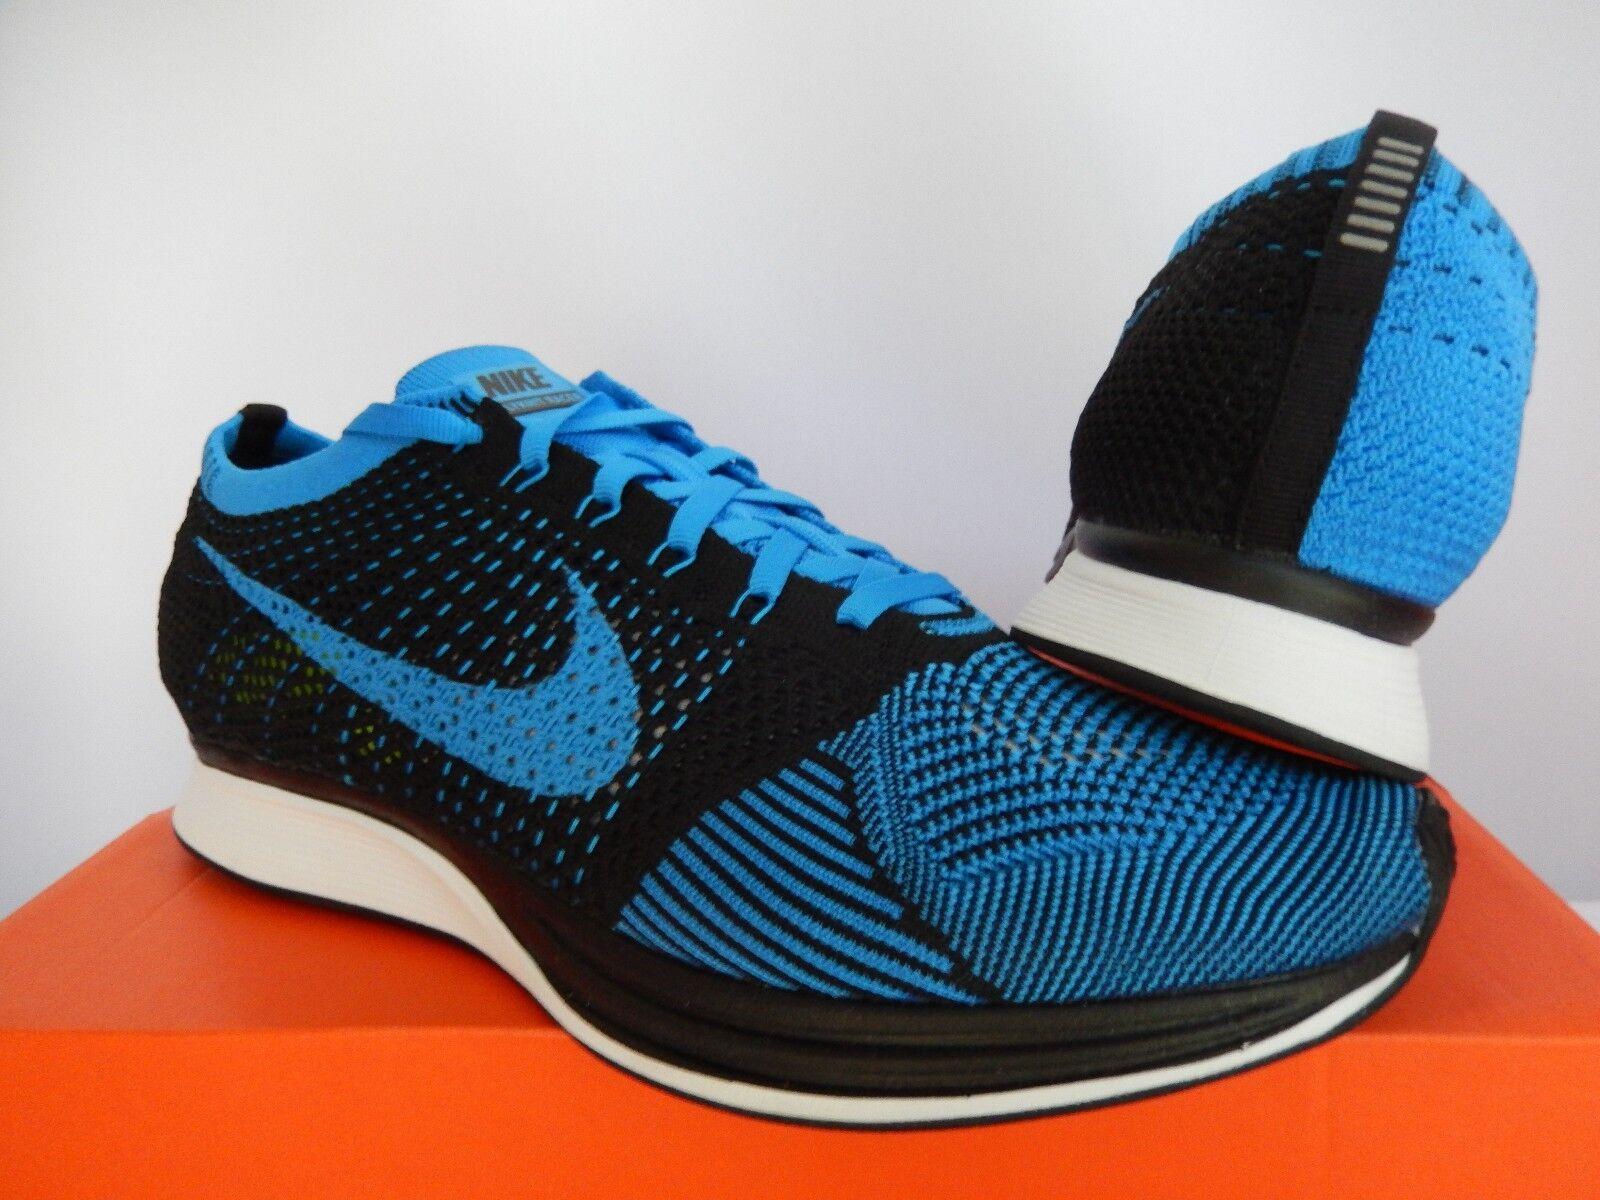 Nike flyknit flyknit Nike racer nero-photo blue-white sz 6,5 uomini / donne sz - 8 45f74f